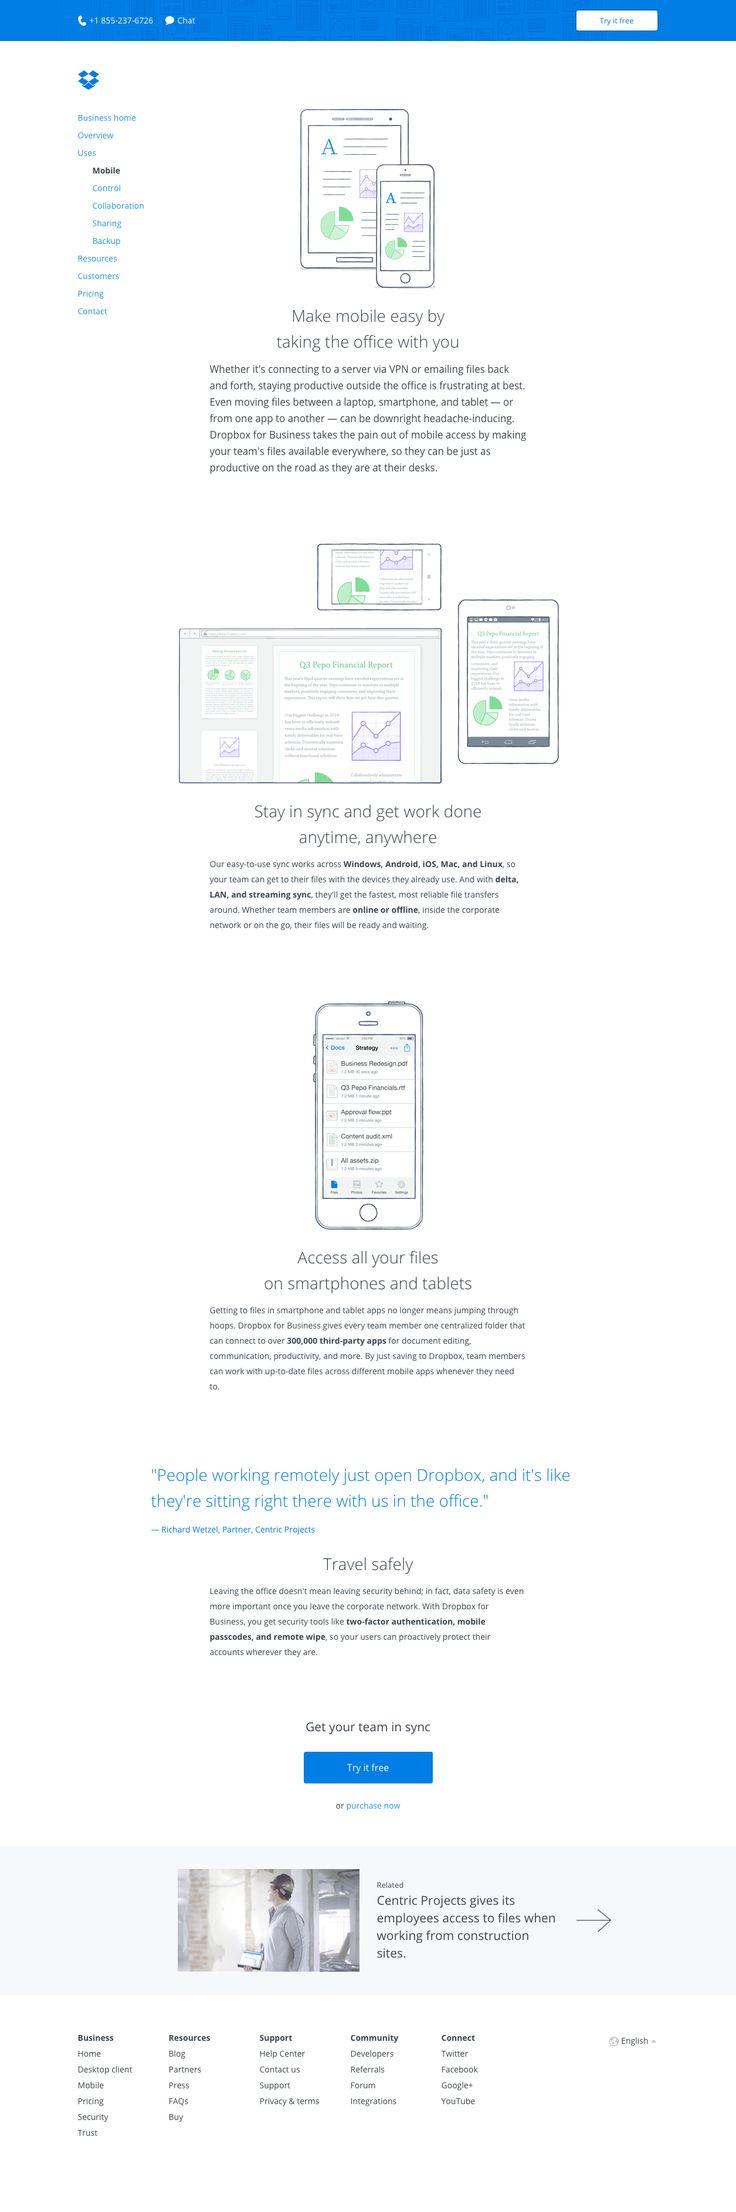 dropbox.com - Business/Mobile-access